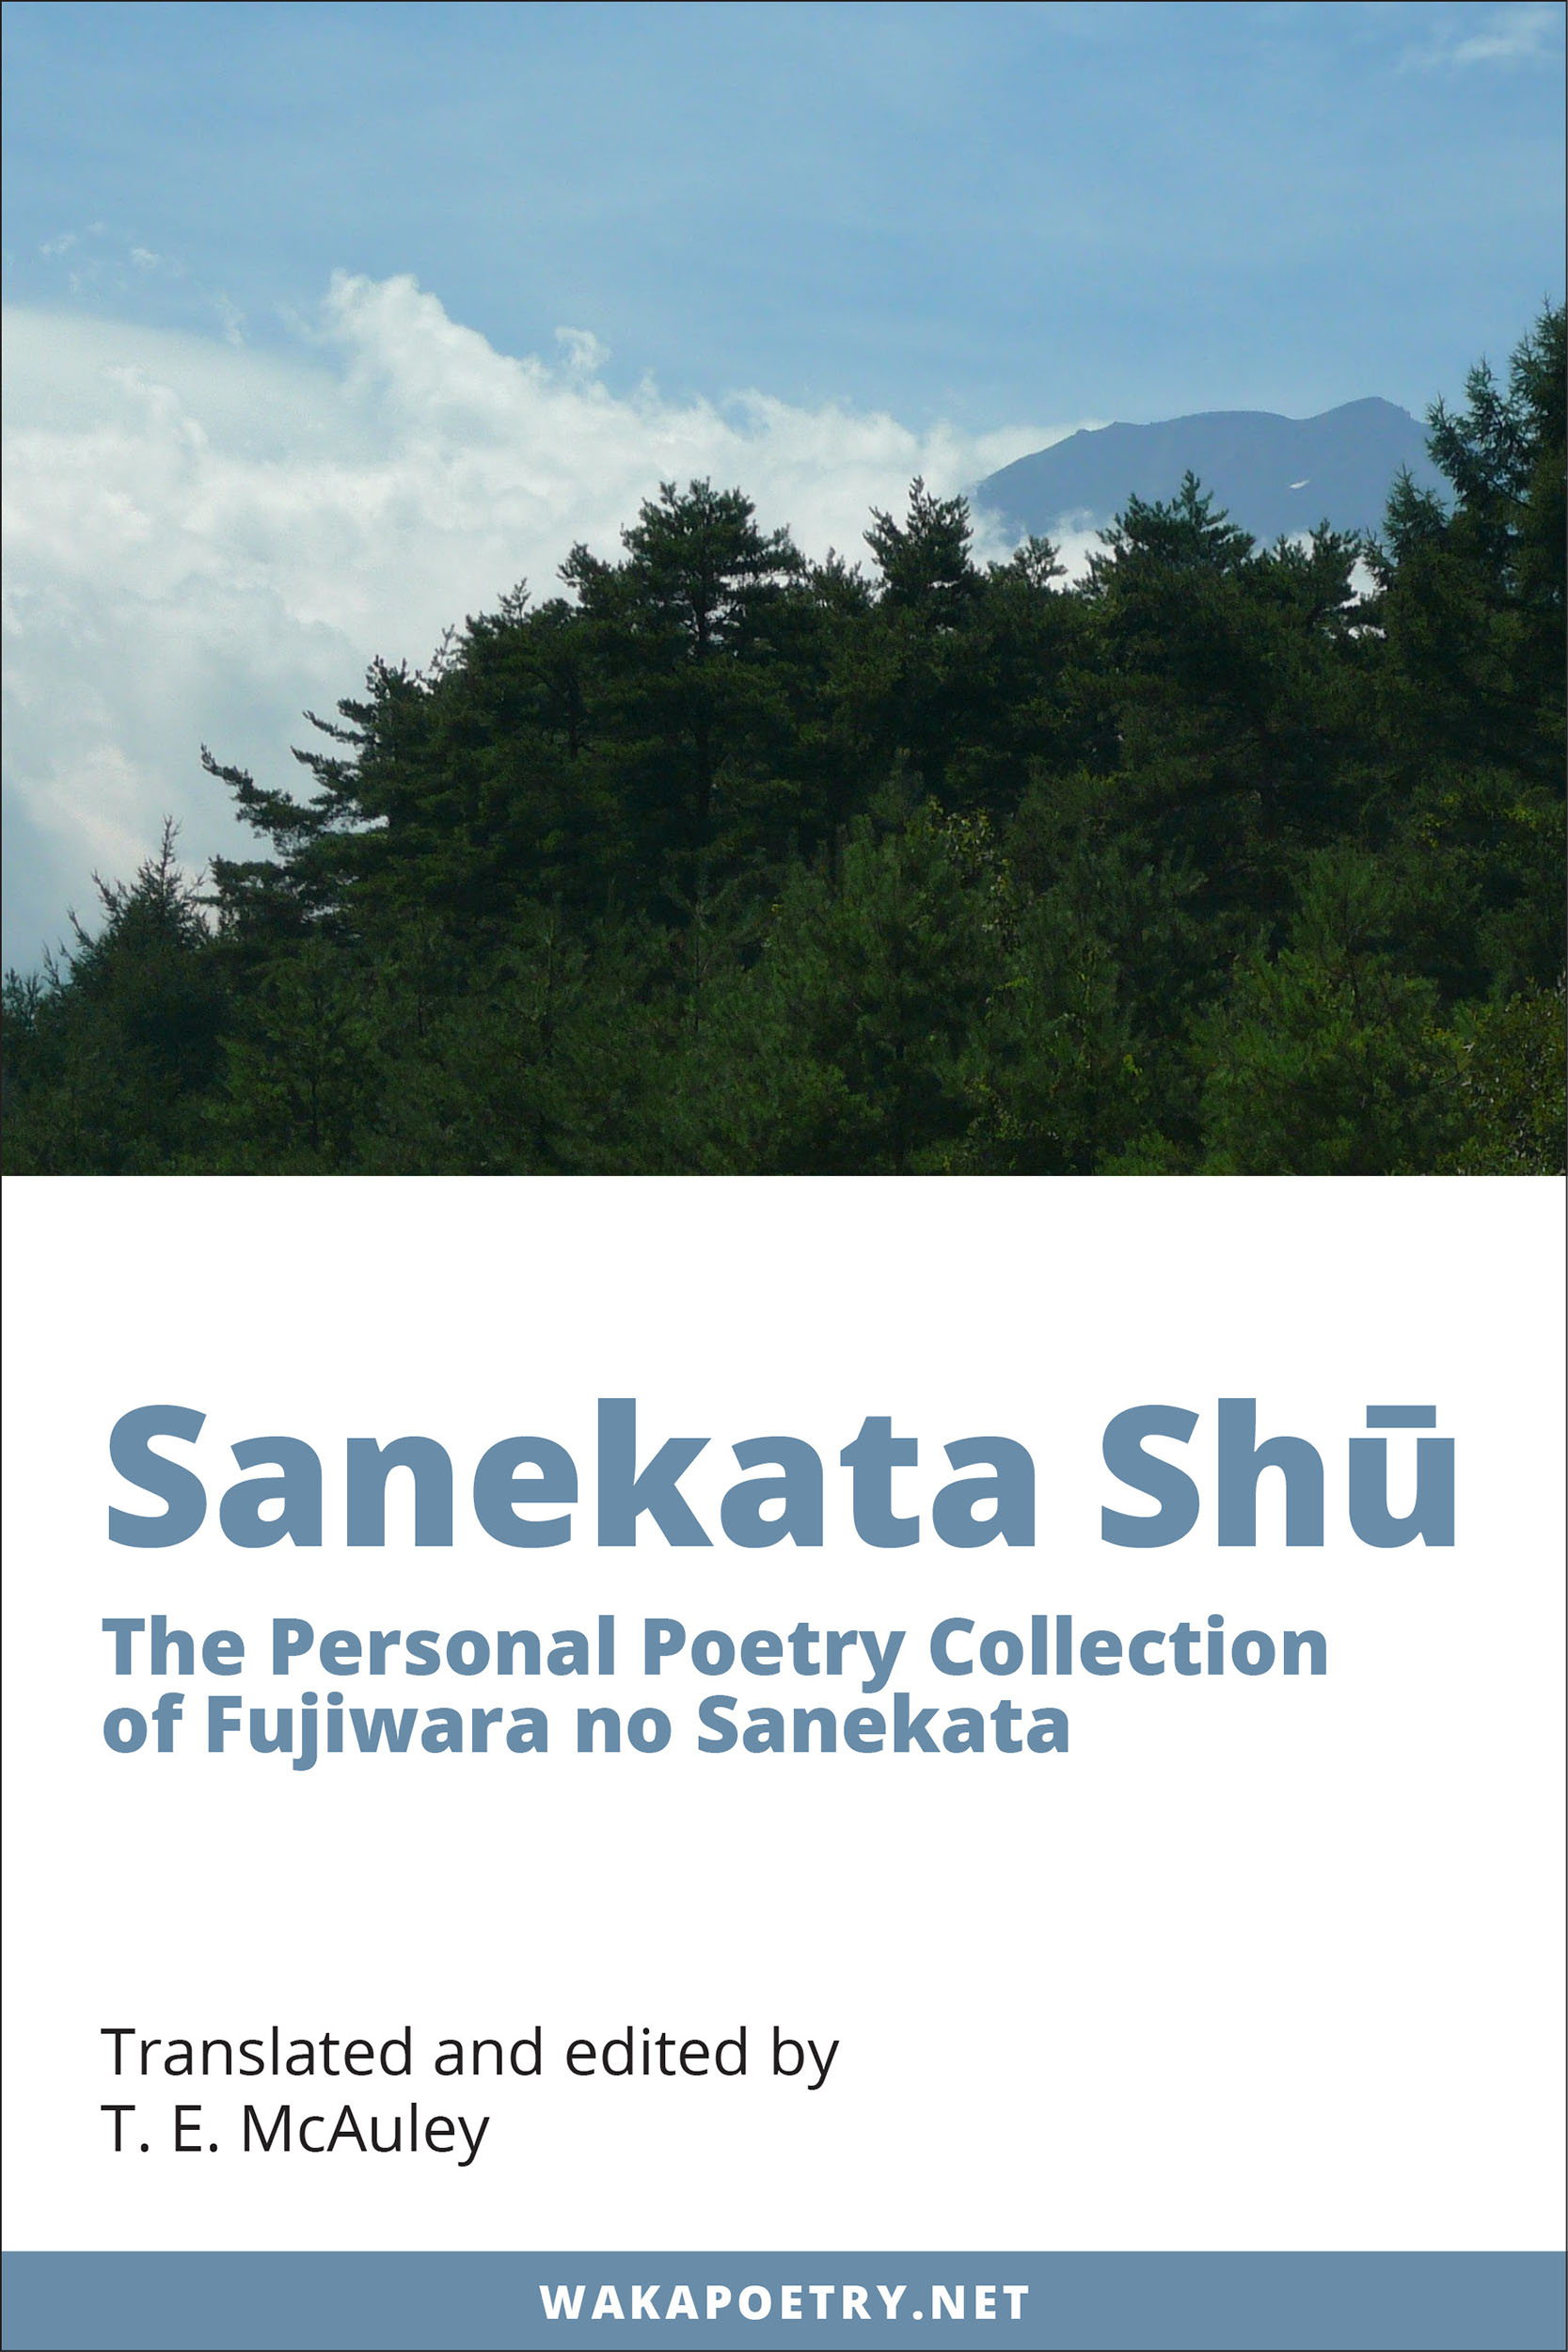 kindle books waka poetry sanekata shu cover 2500x1667 2016 11 29